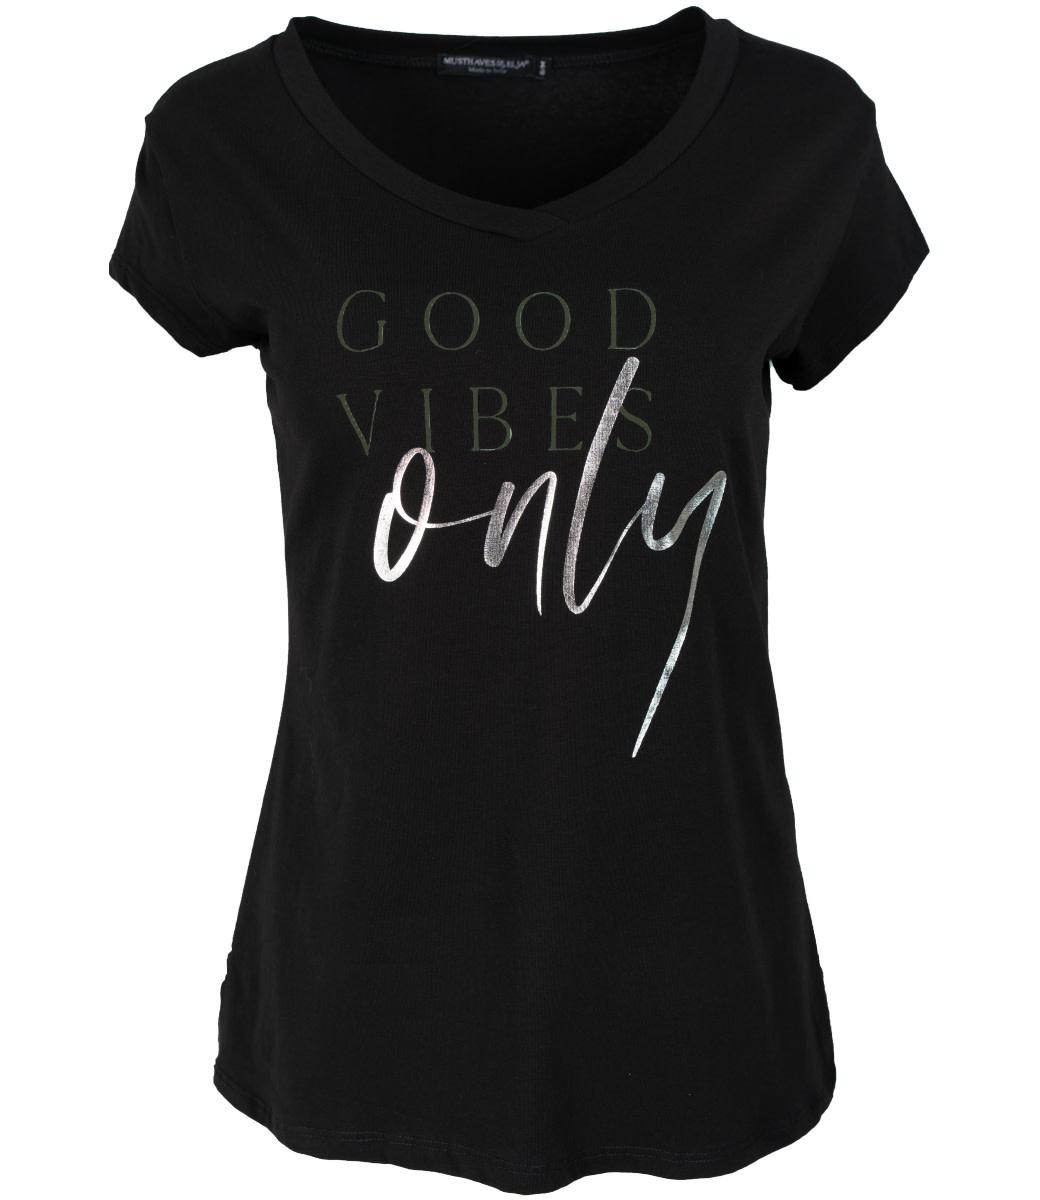 Wannahavesfashion Shirt zwart/groen good vibes only